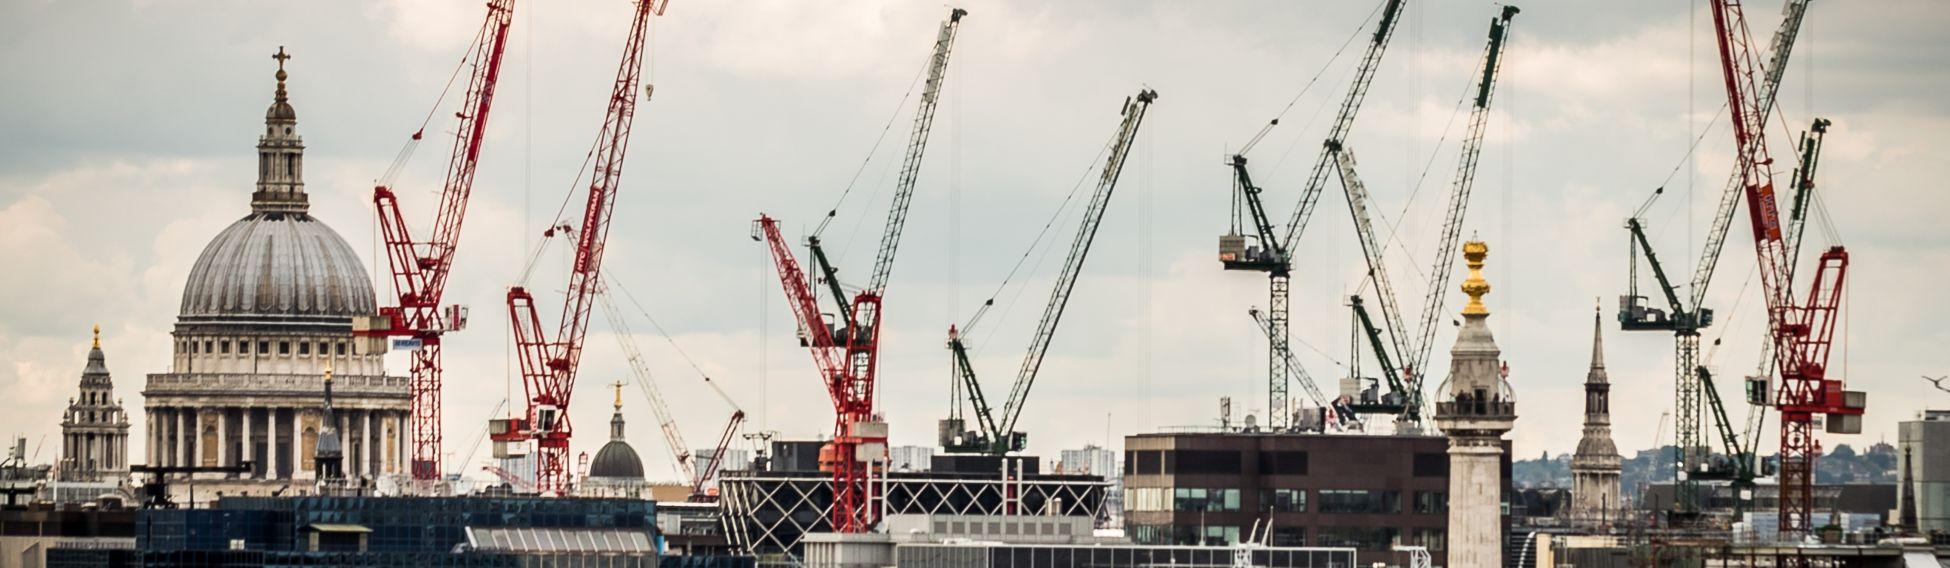 cranes over london